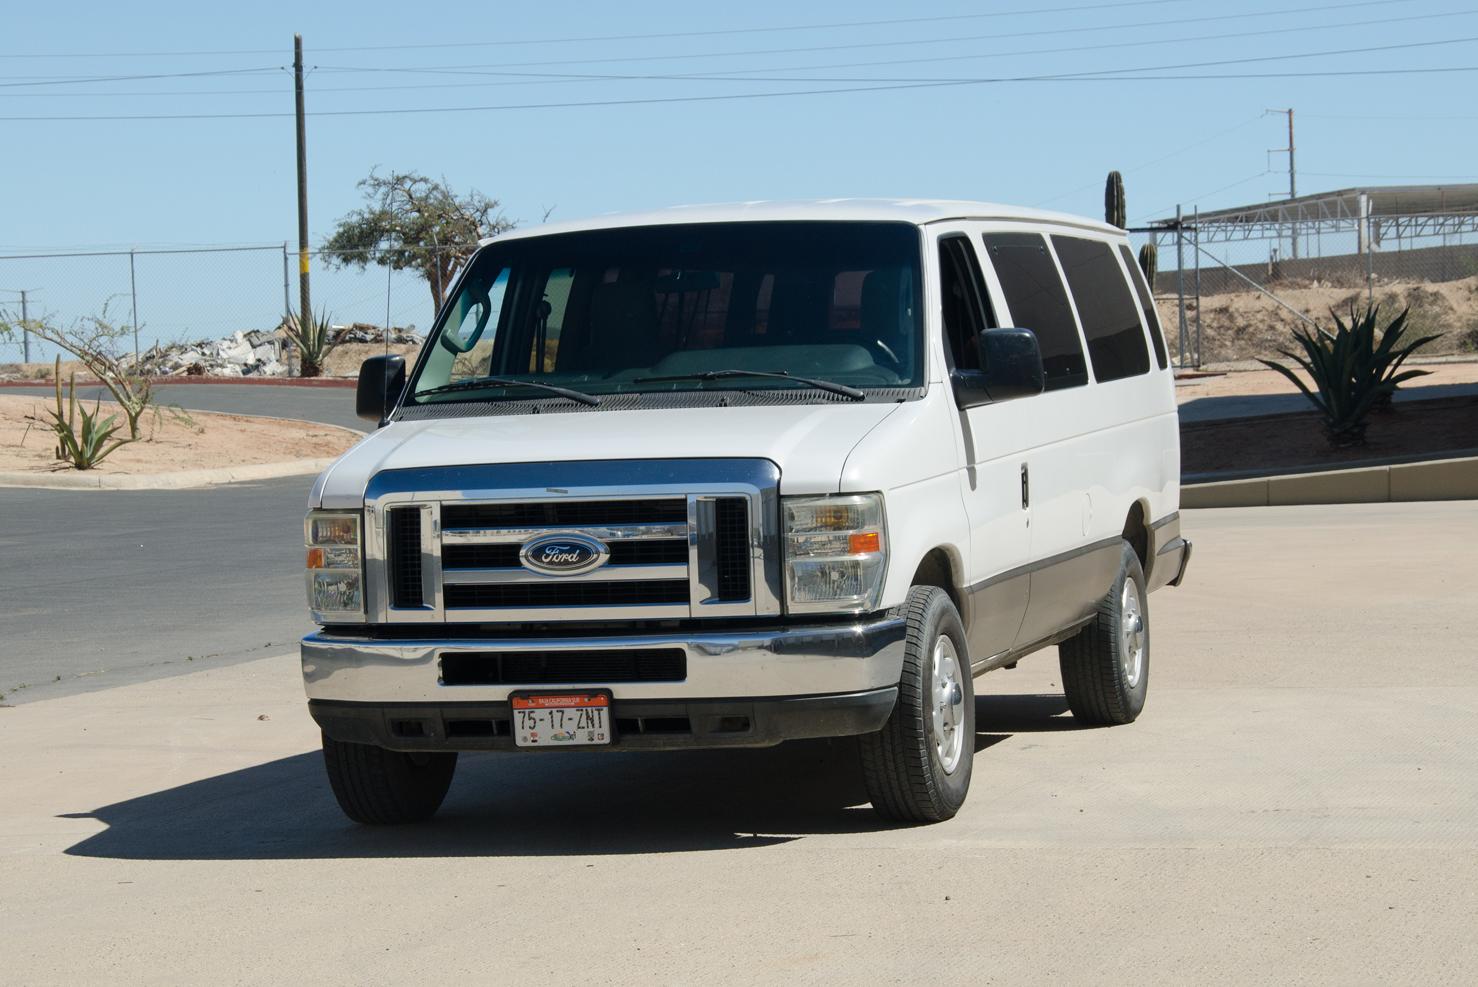 Ford Super Duty   Camionetas Vans para 12-15 Pasajeros   BBB Rent a Car Los Cabos Mexico